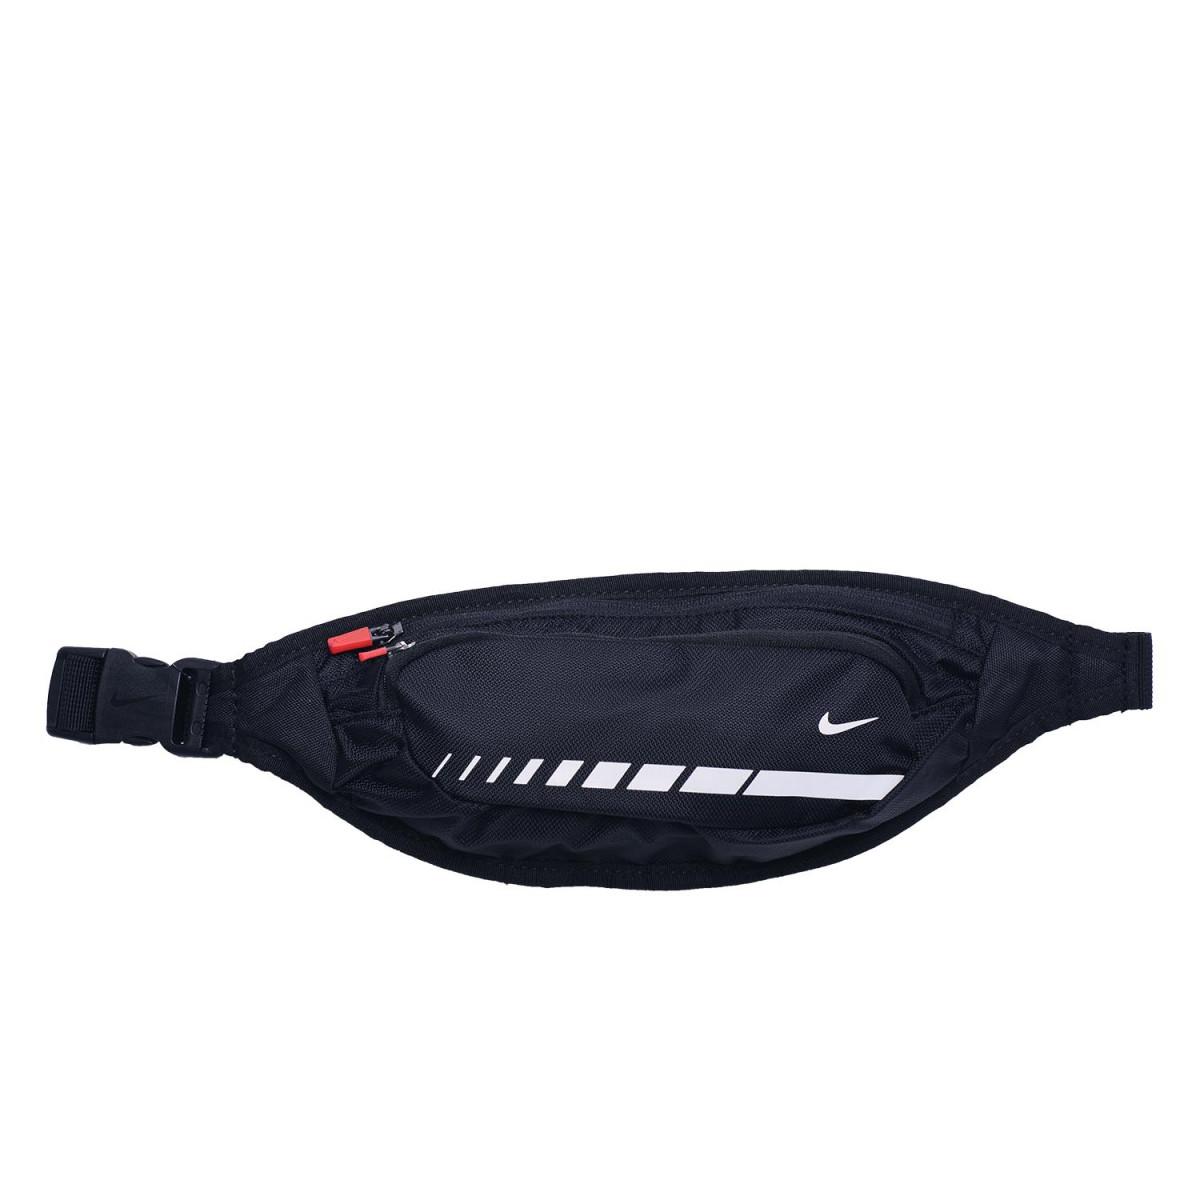 926f20a83 Riñonera Nike Waistpack 3.0 - Bolsos - Accesorios - Mujer